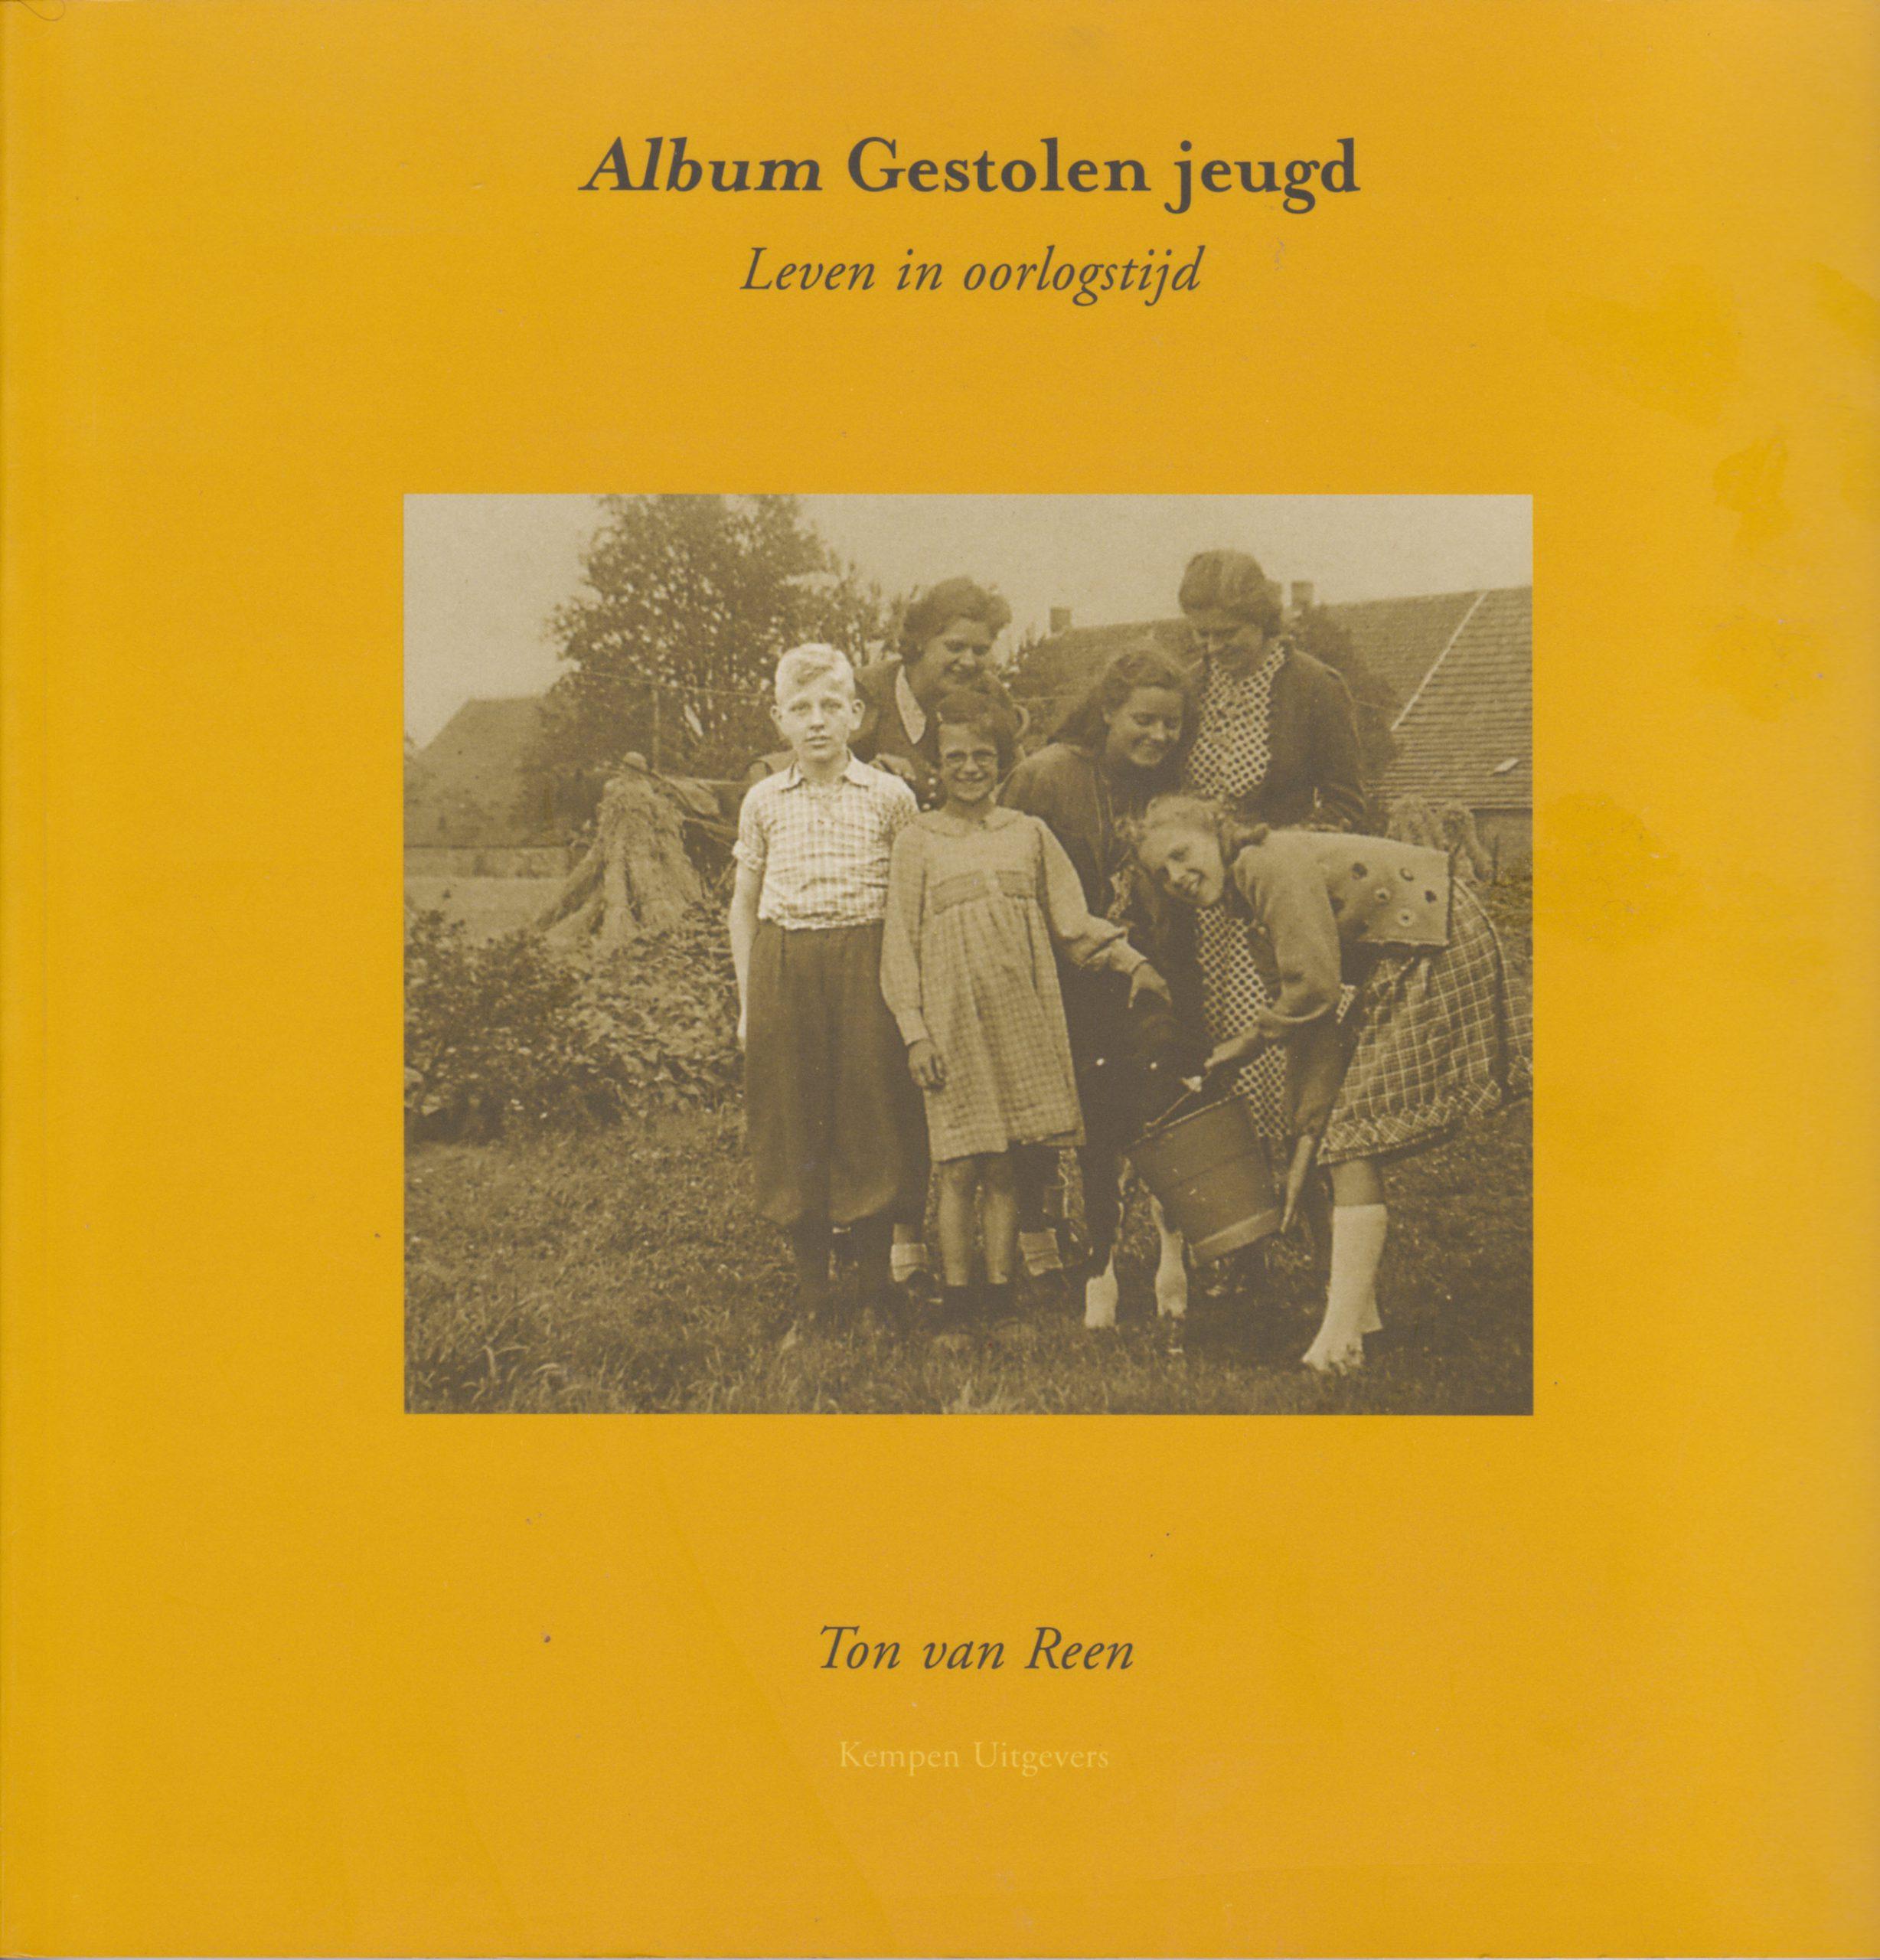 Album gestolen jeugd Kempen